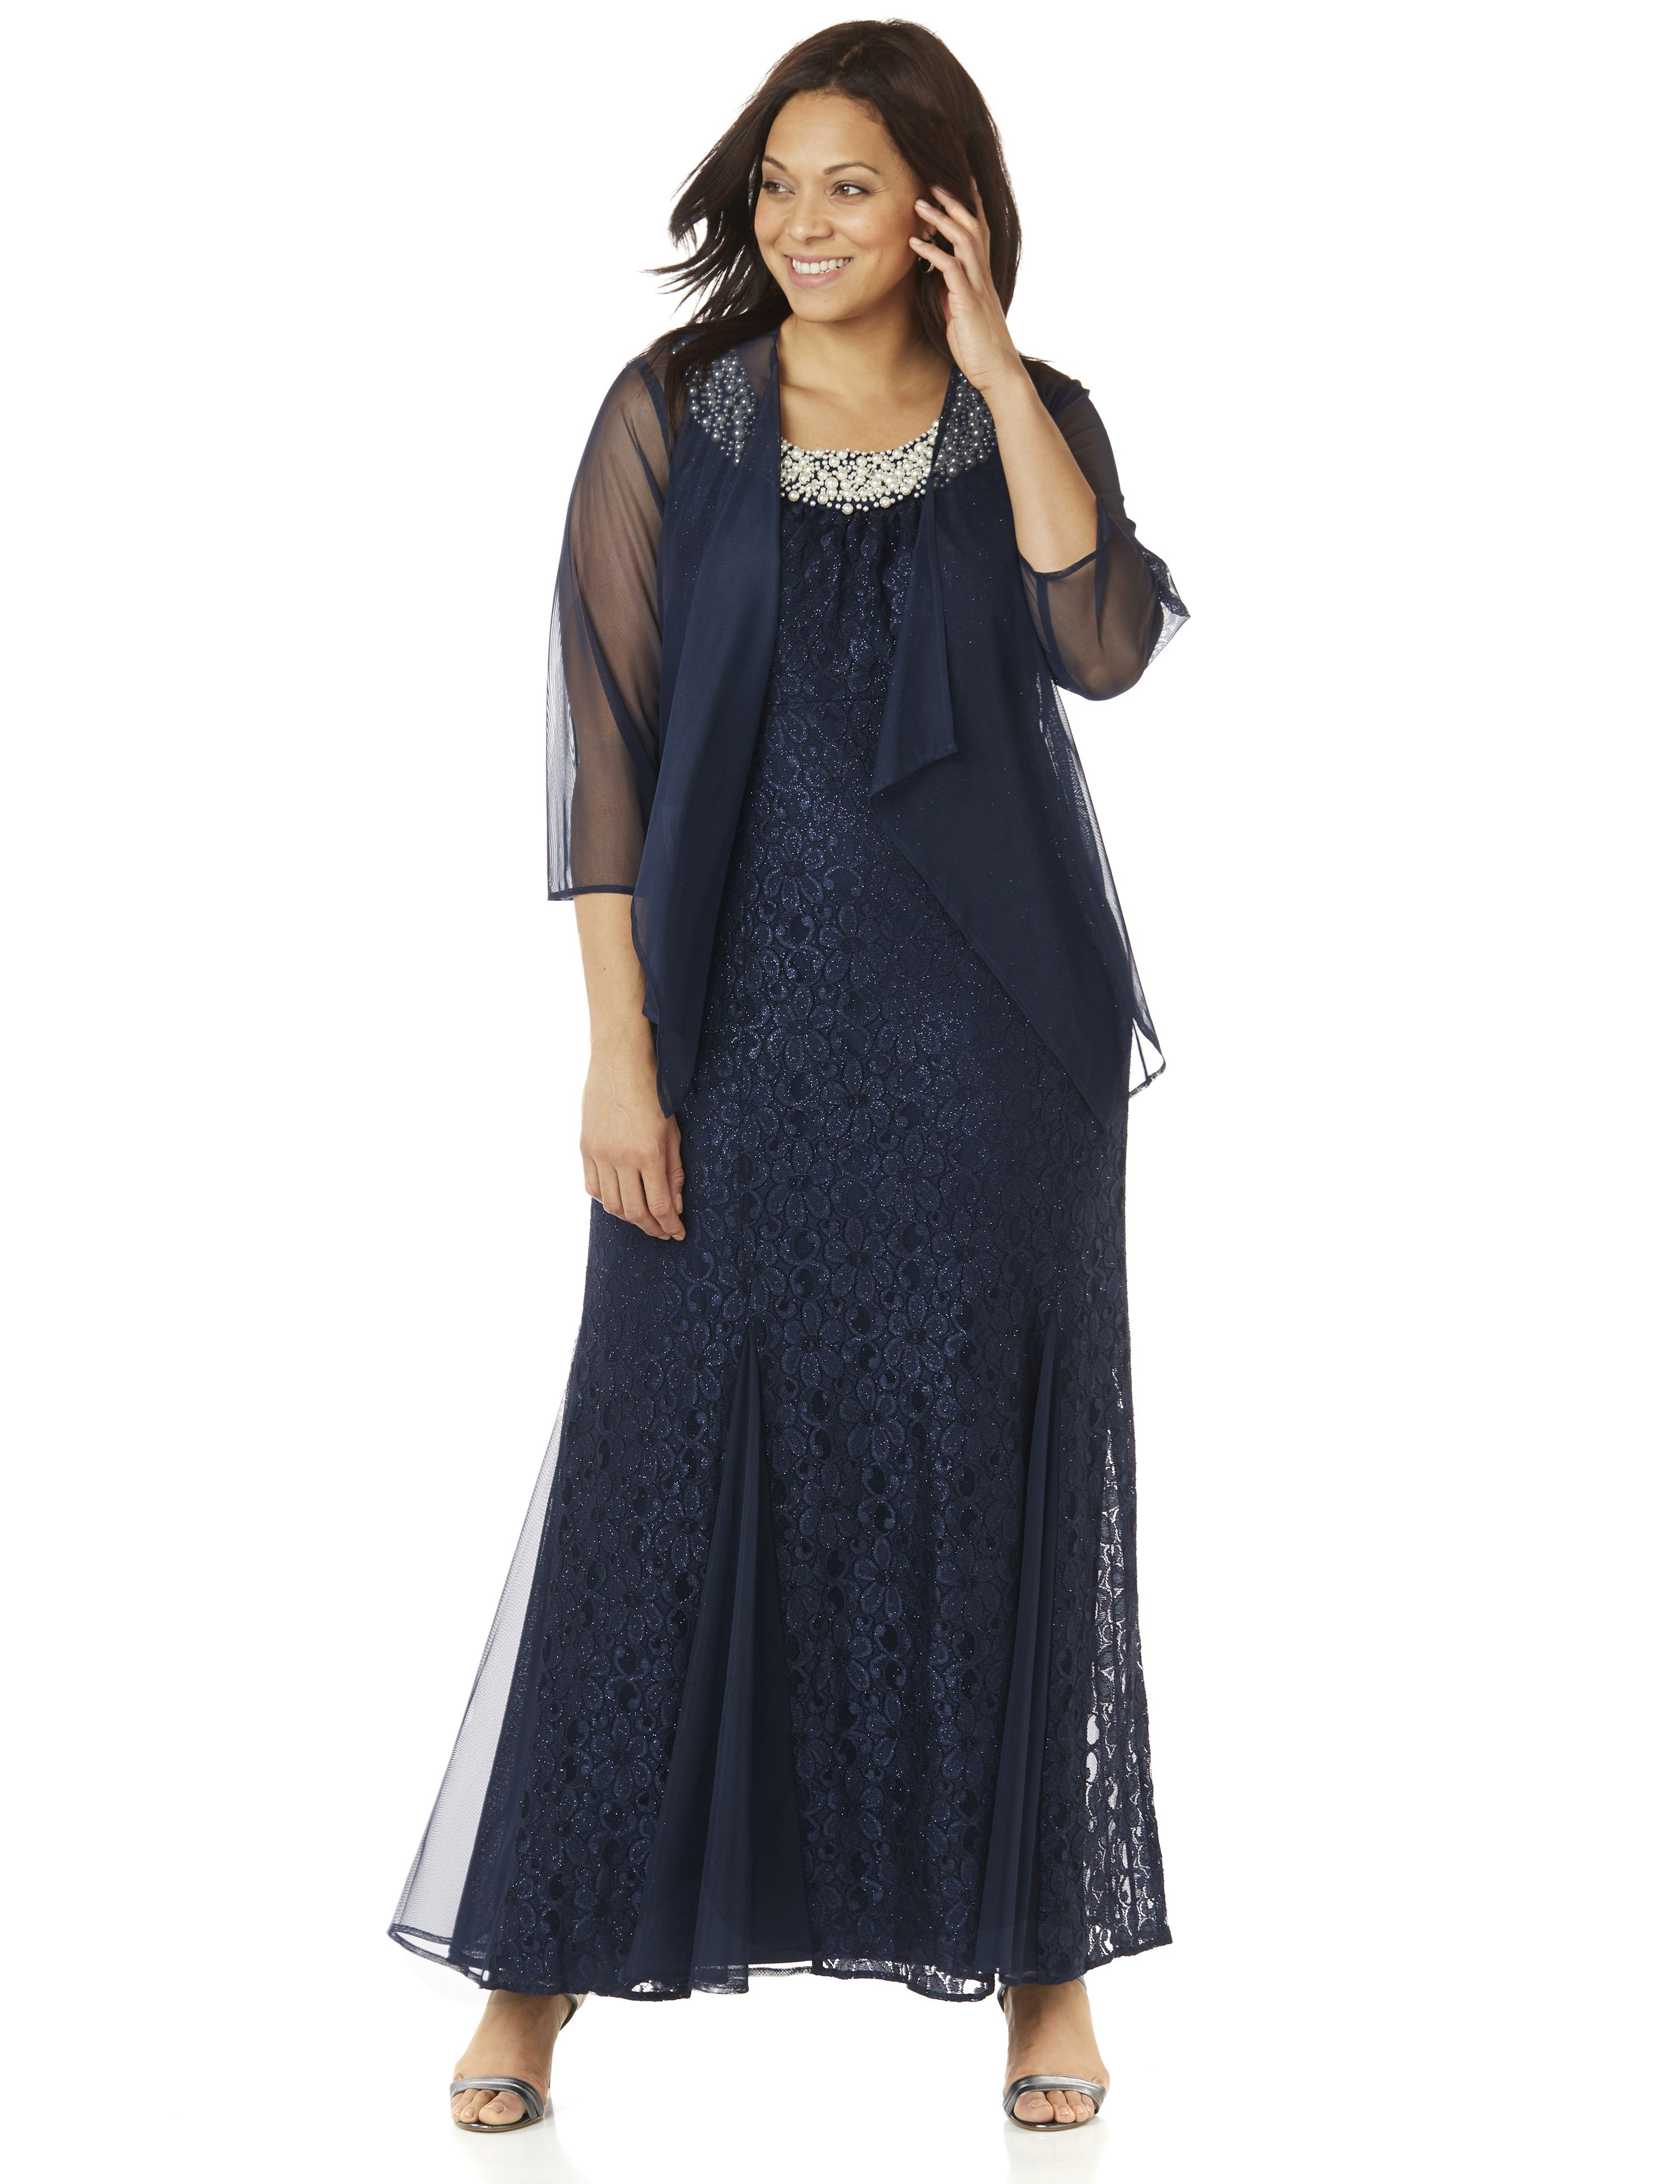 Plus Size Retro Dresses Saturday Night Gown $159.99 AT vintagedancer.com